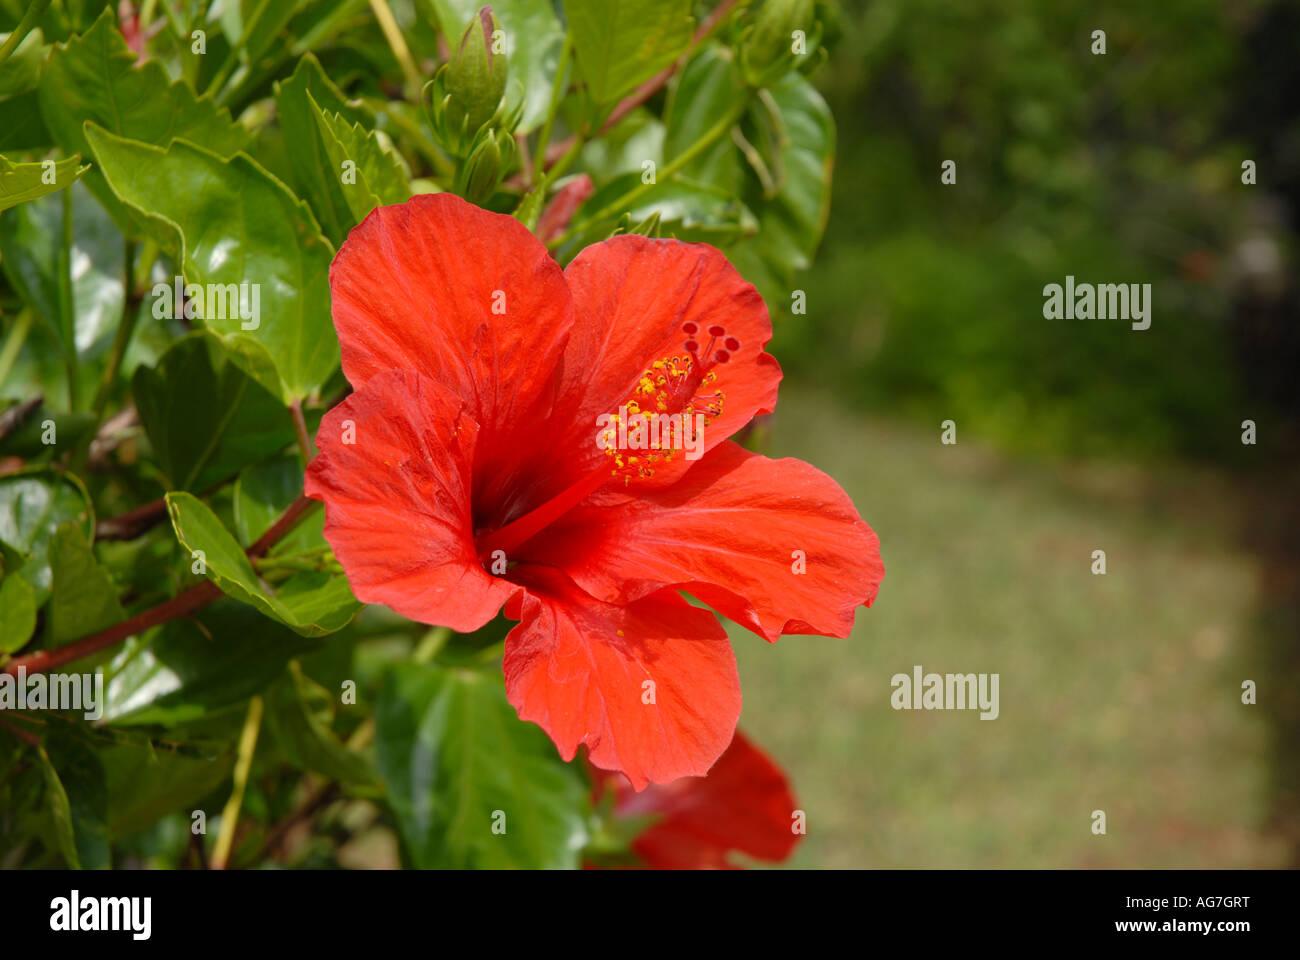 Red hibiscus in full bloom stock photos red hibiscus in full bloom bright red hibiscus flower in full sun stock image izmirmasajfo